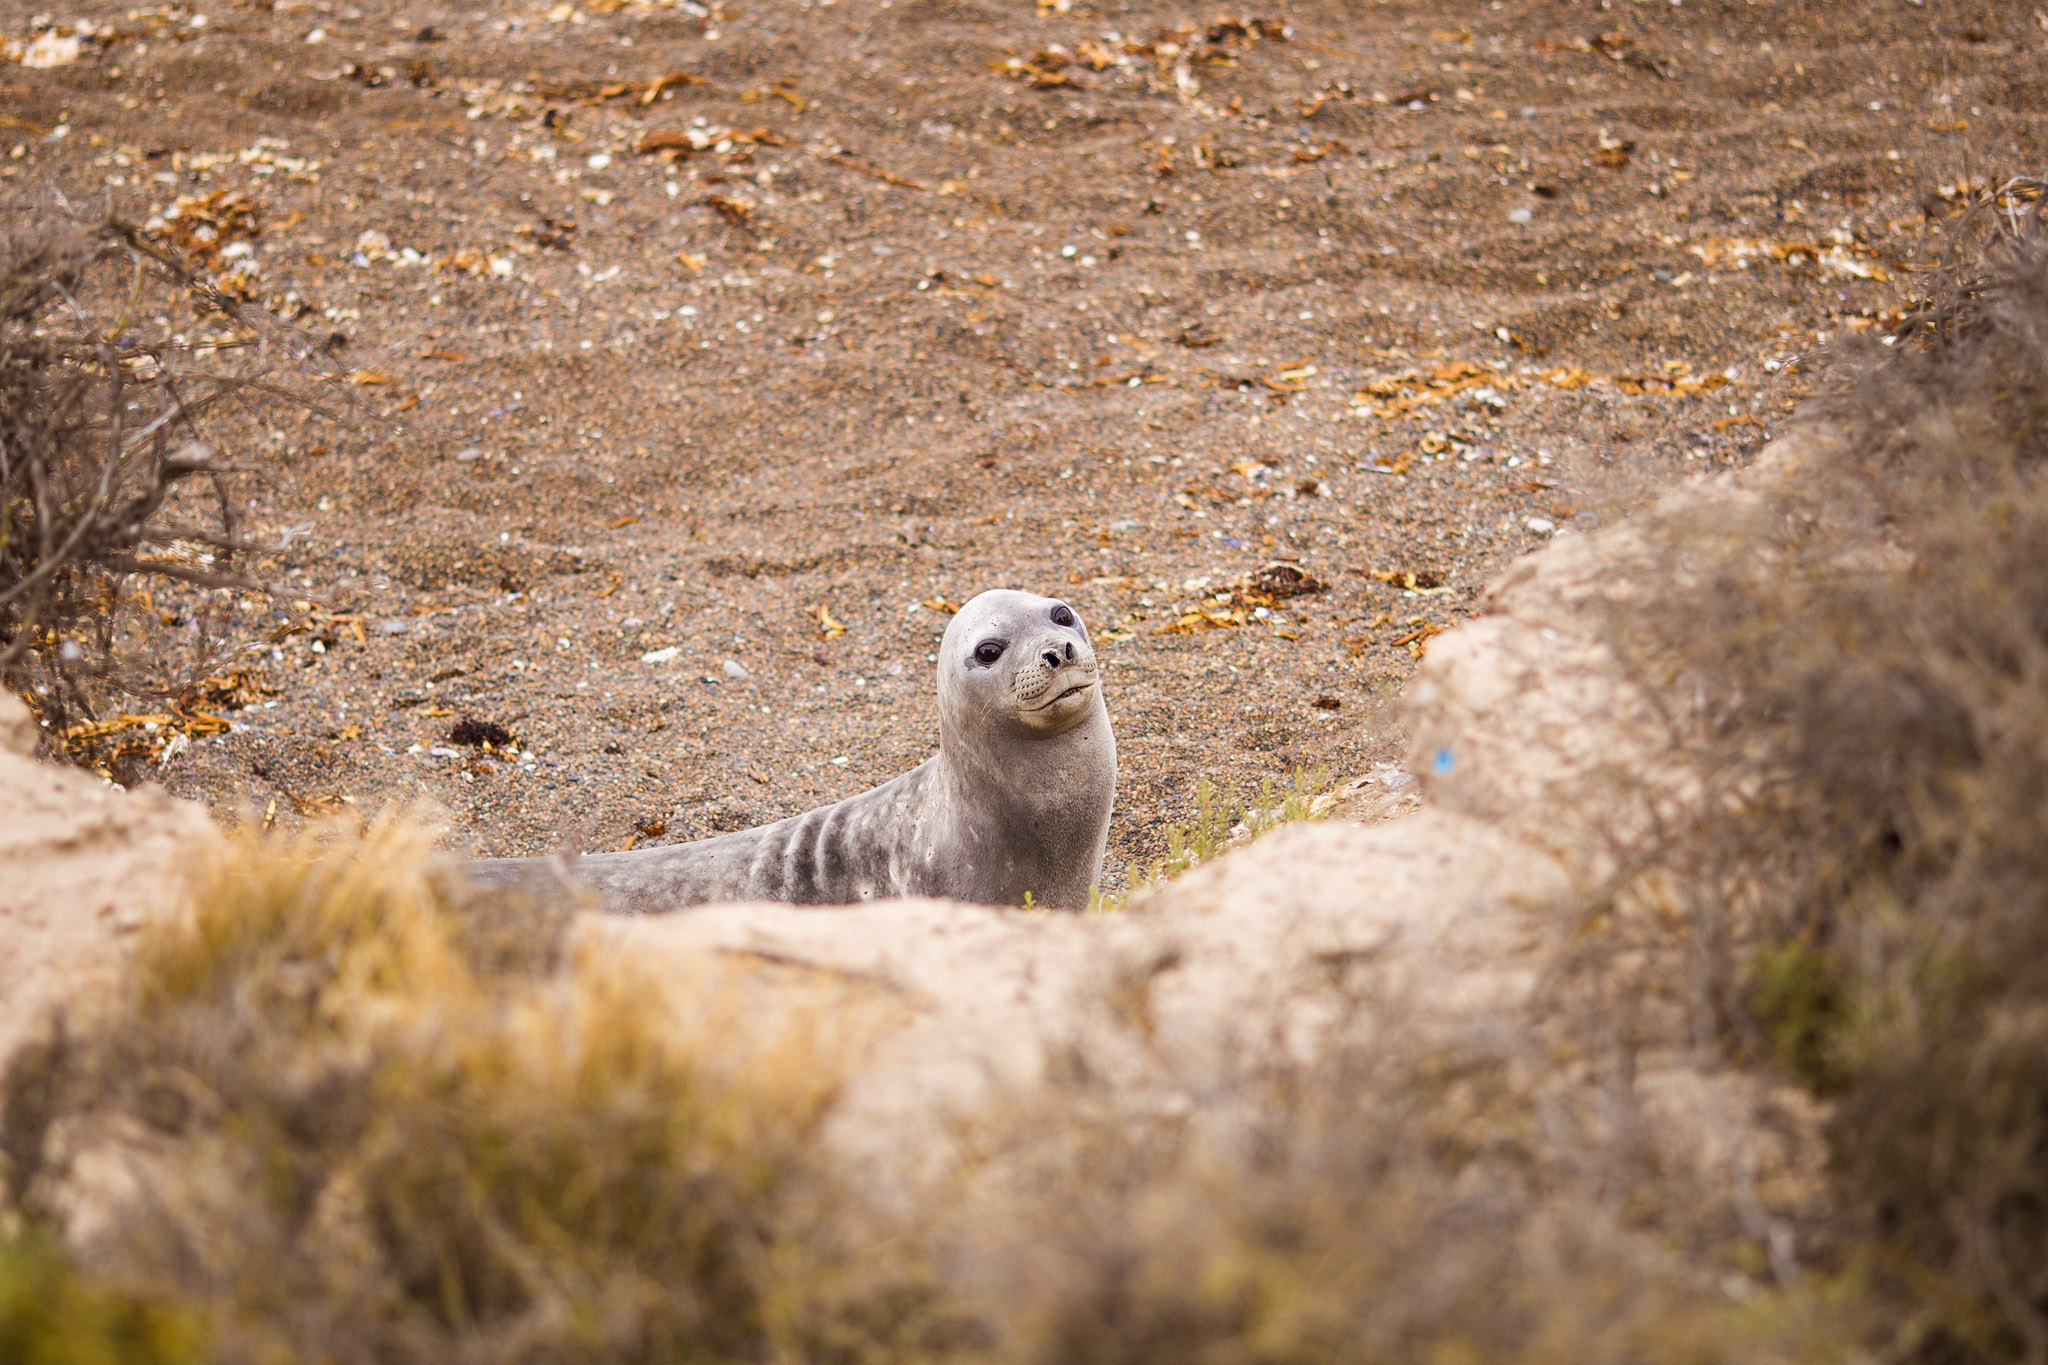 wedding-travellers-argentina-peninsula-valdes-elephant-seal